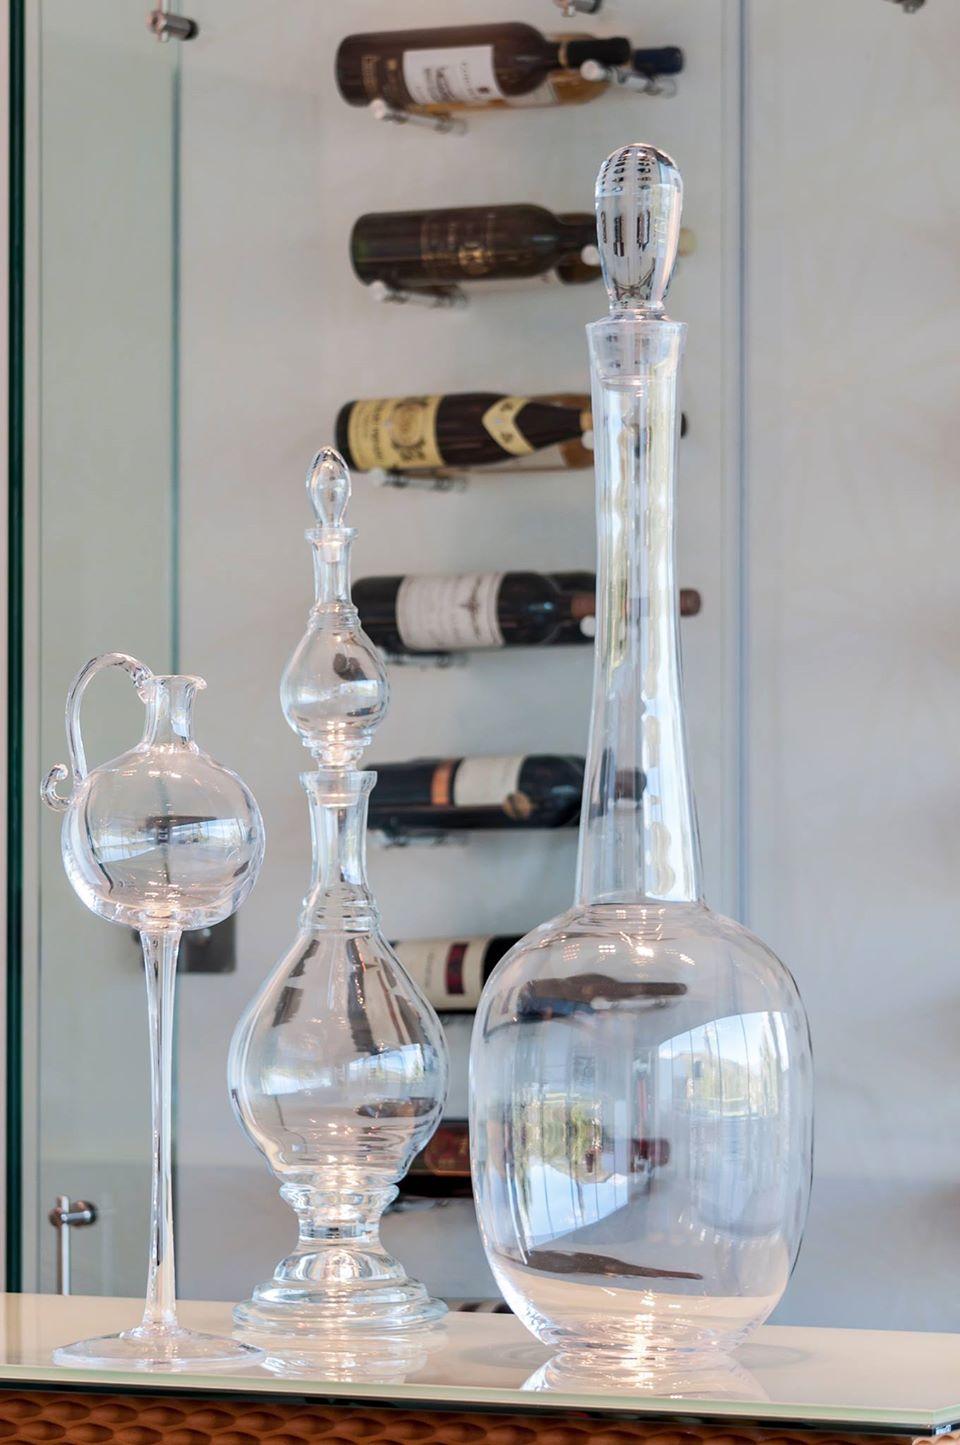 Dining Room with Silver Mirrors: Caducus Folium Ecuador & Arq. Rosa Cristina Laureiro